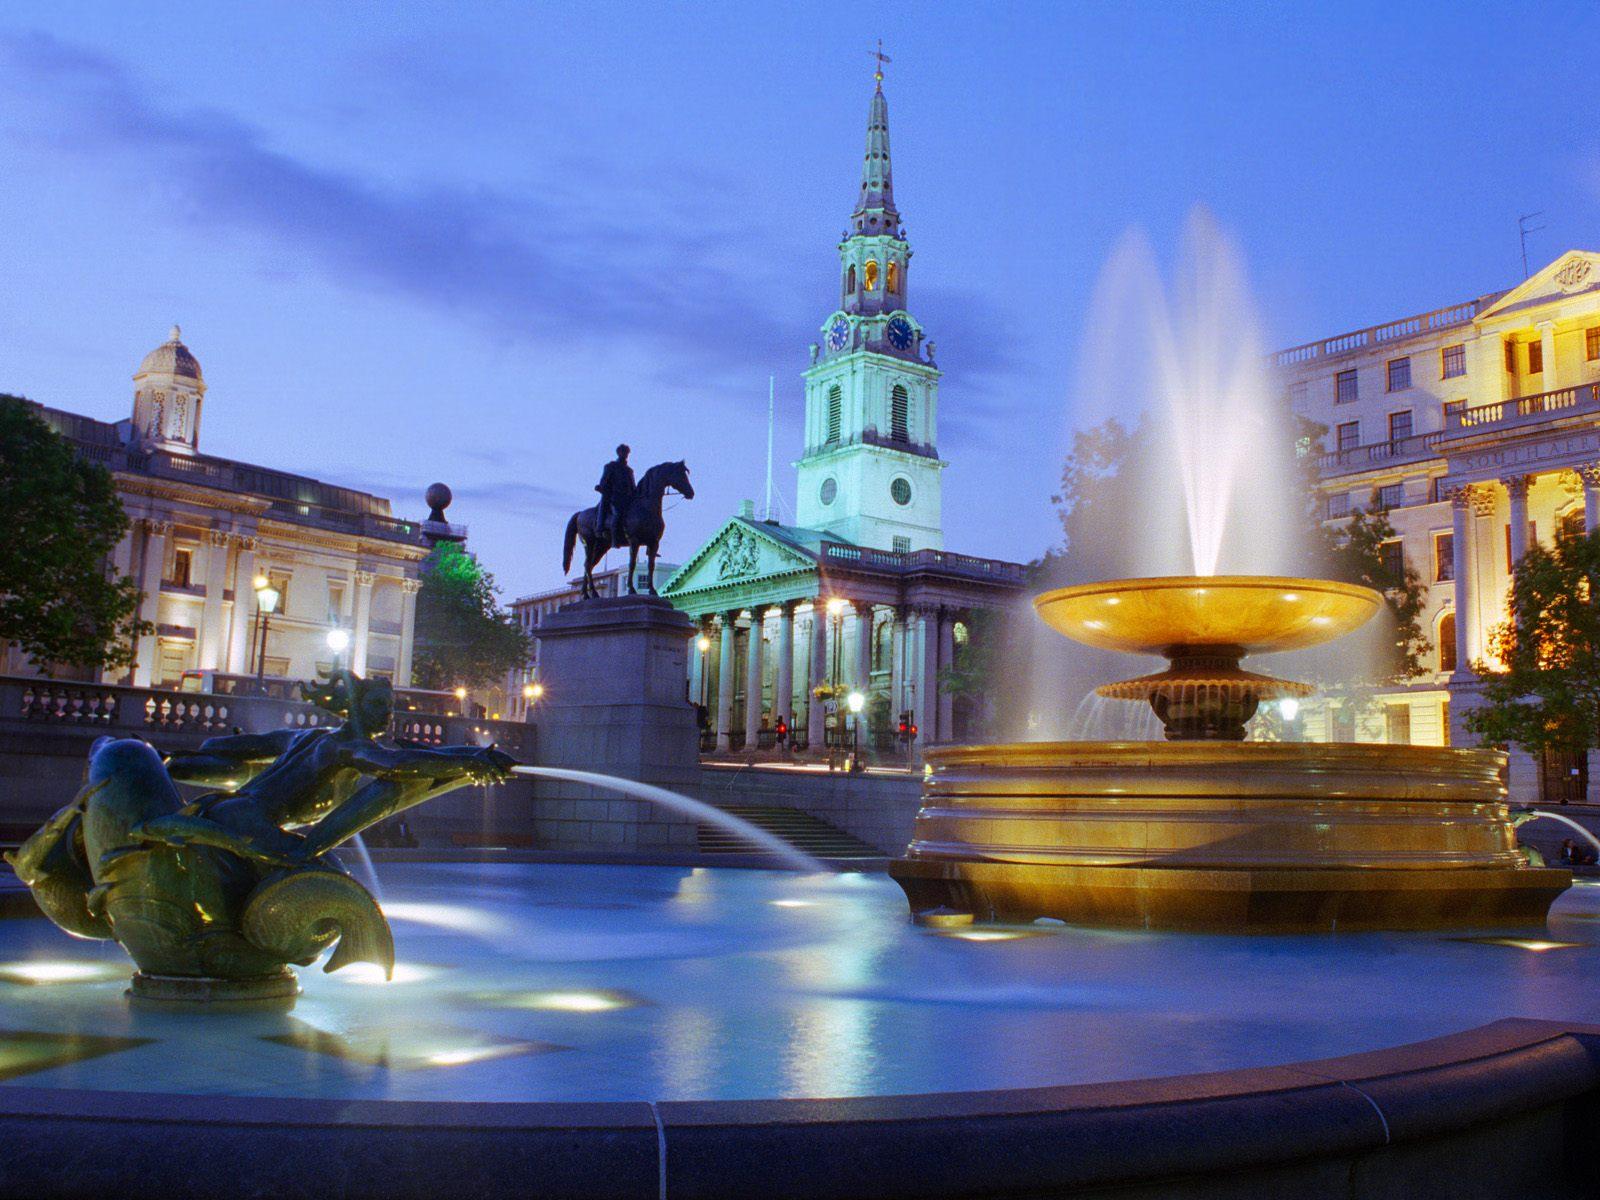 Engleska London-England-great-britain-31748900-1600-1200